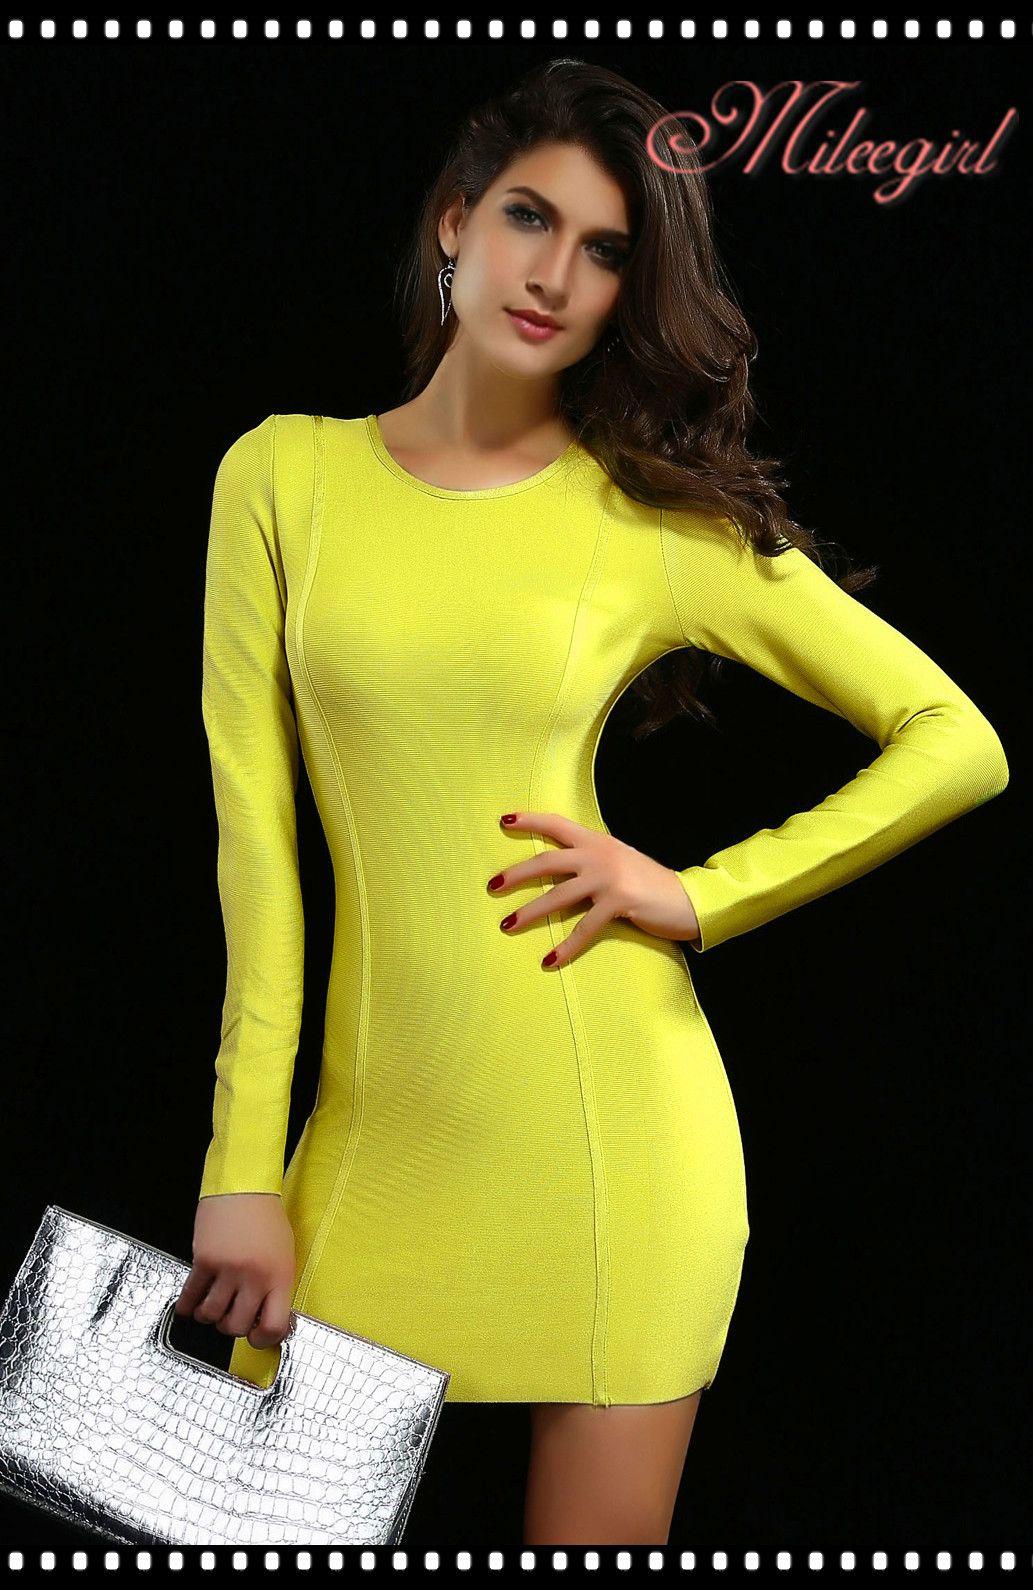 Dresses women fashion pinterest formal woman and fashion